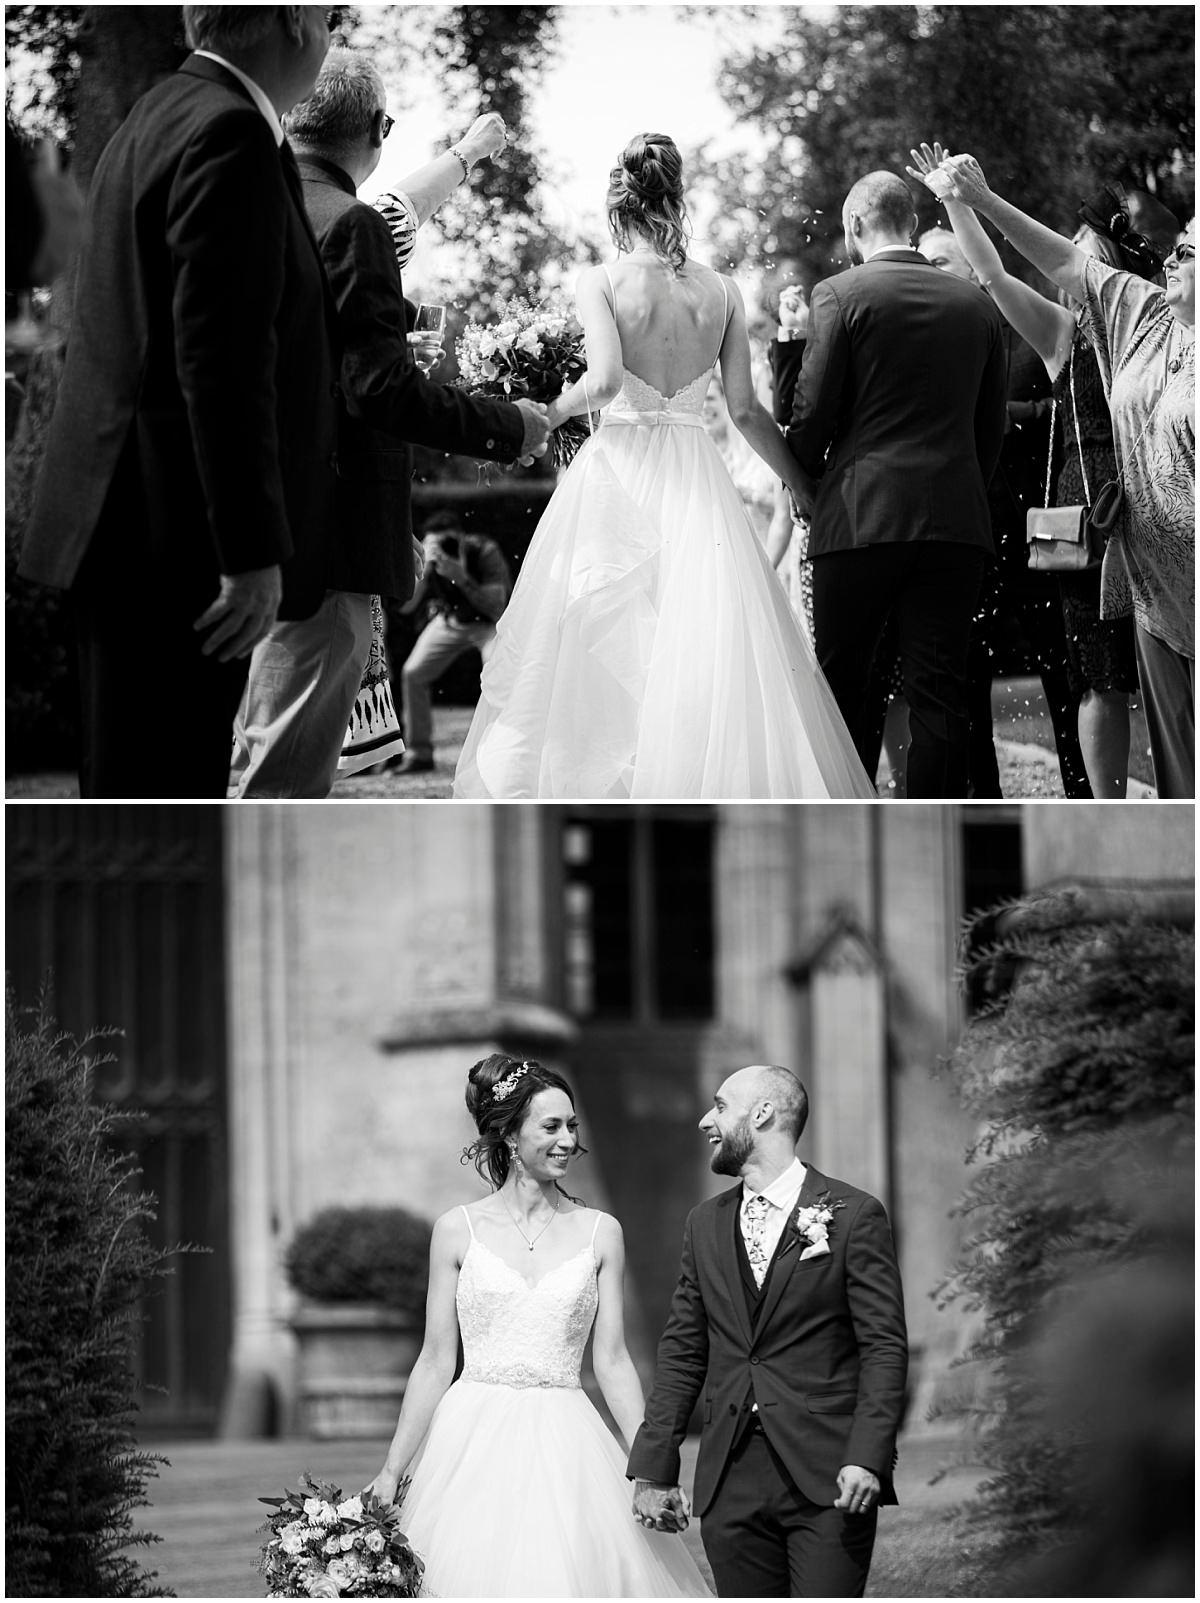 Bride and groom at Belvoir Castle